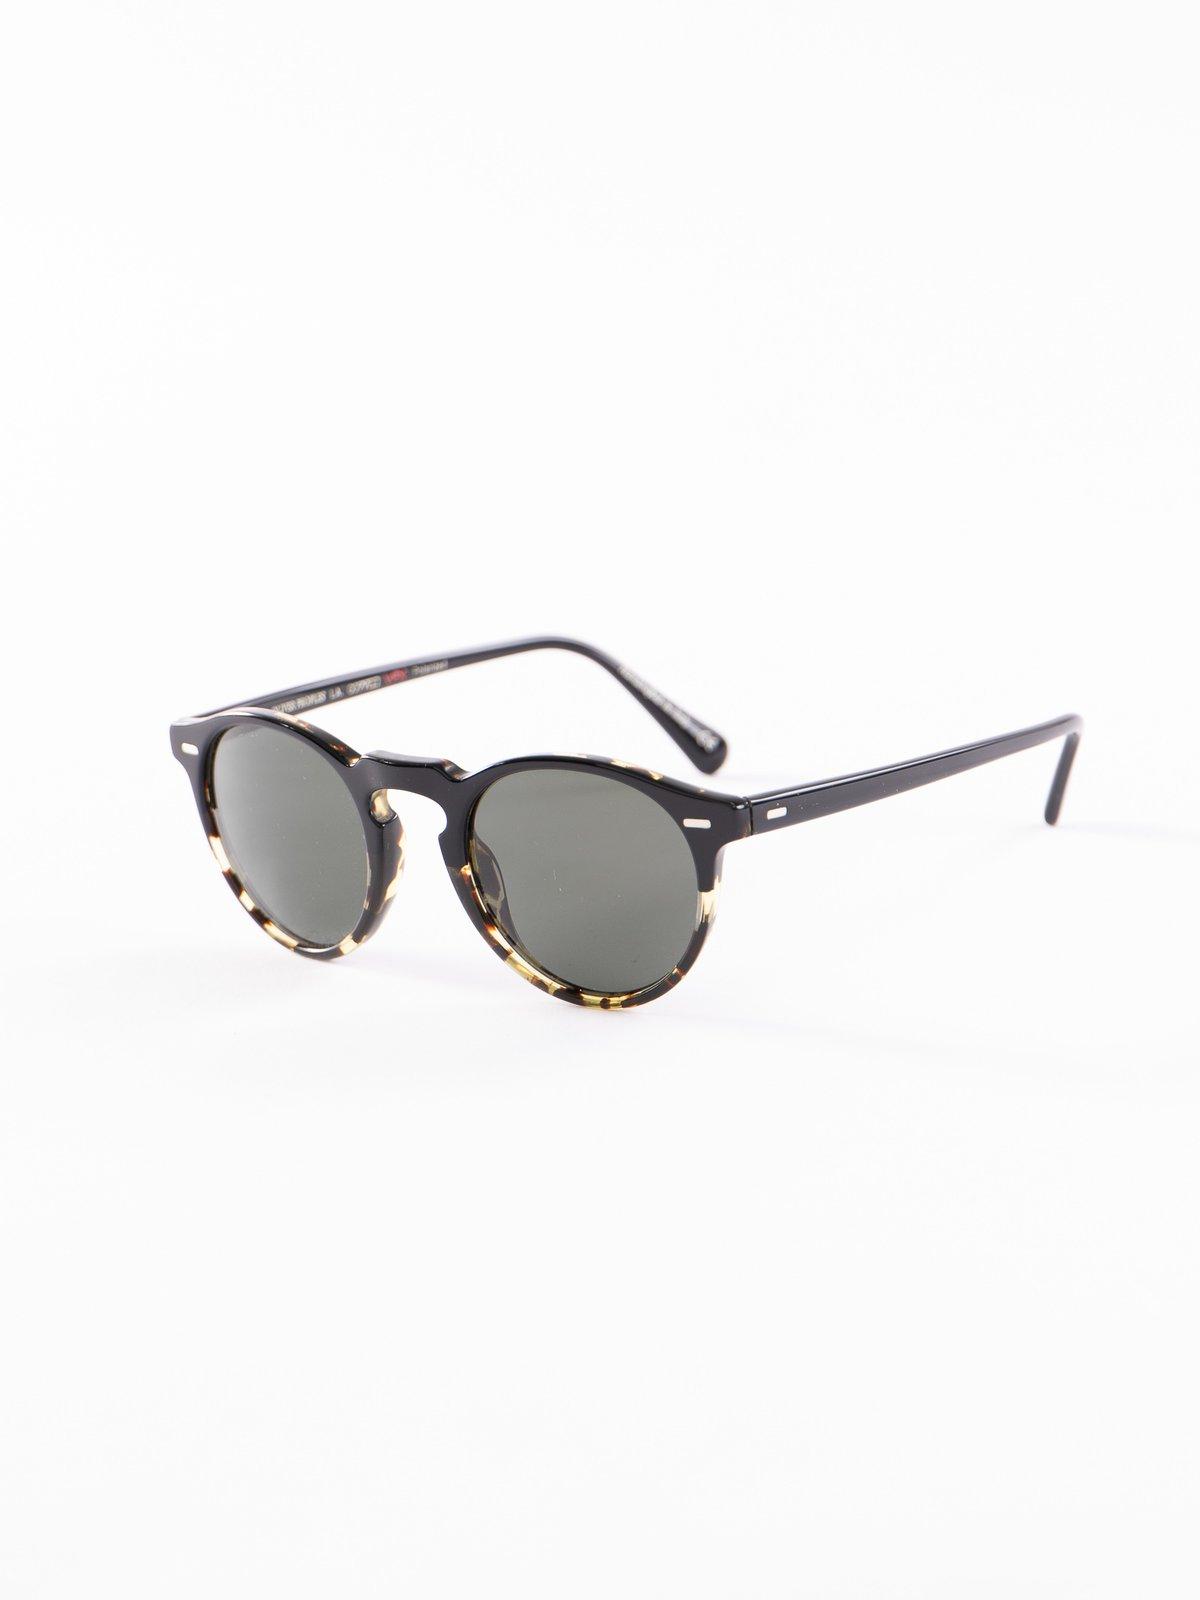 Black–DTBK Gradient/Green Polar Gregory Peck Sunglasses - Image 2